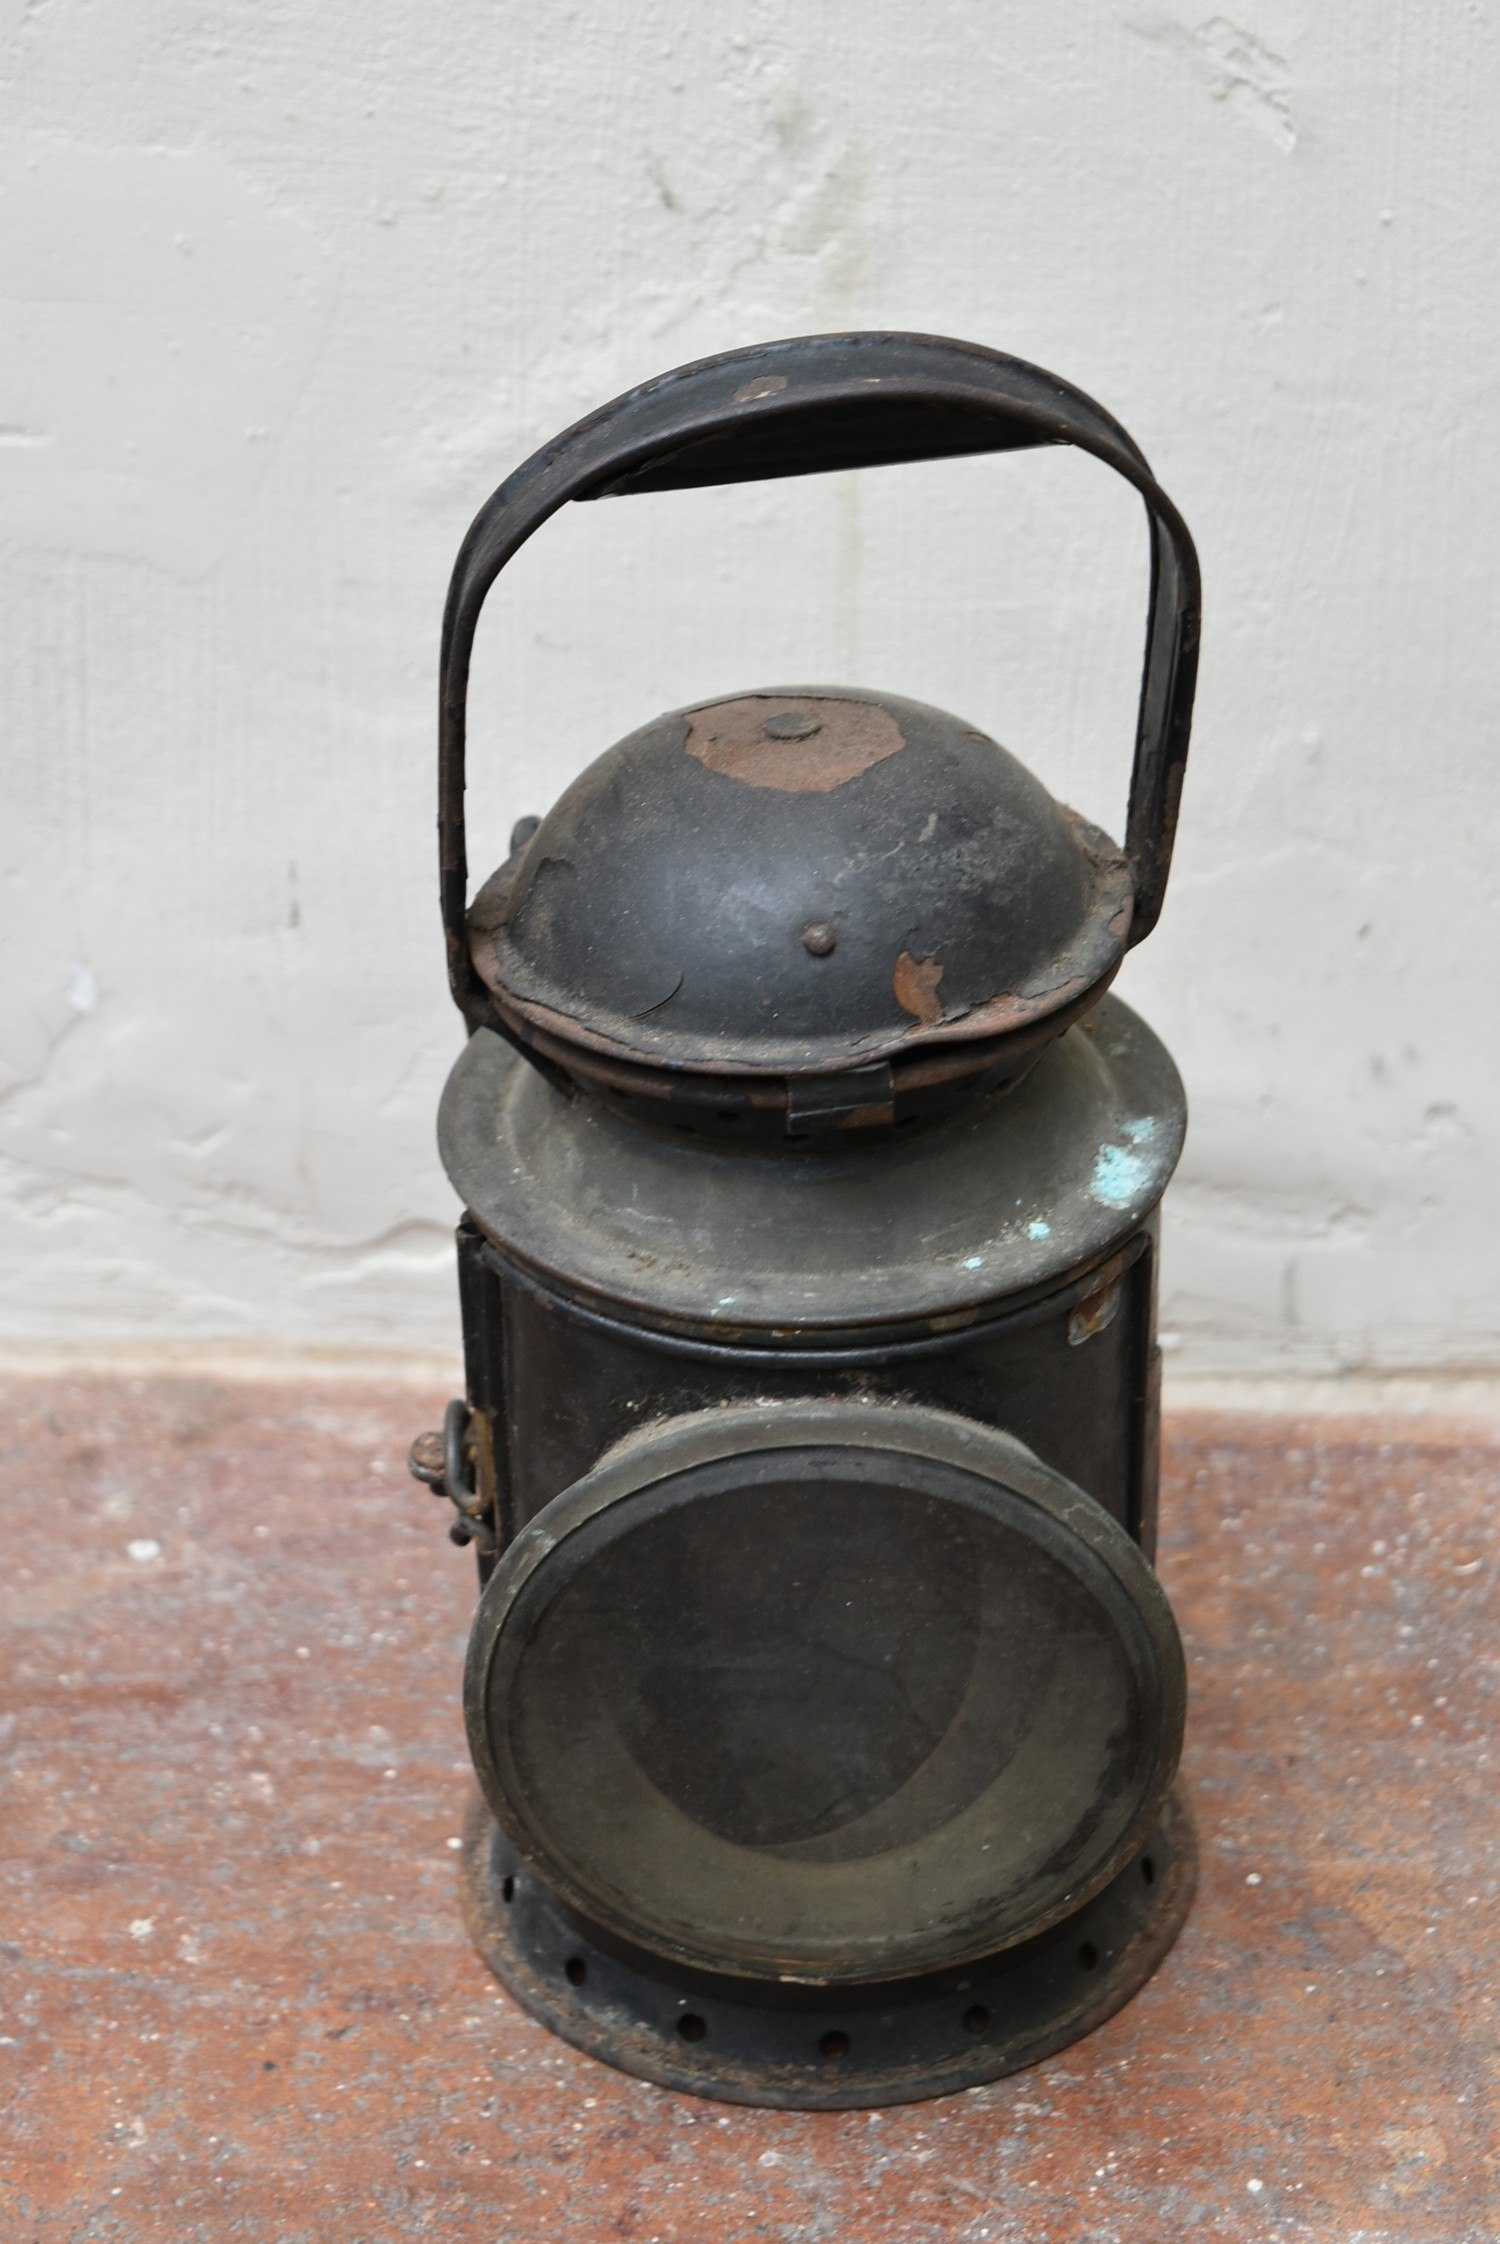 A vintage railwayman's metal cased signal lantern. H.32cm - Image 2 of 3